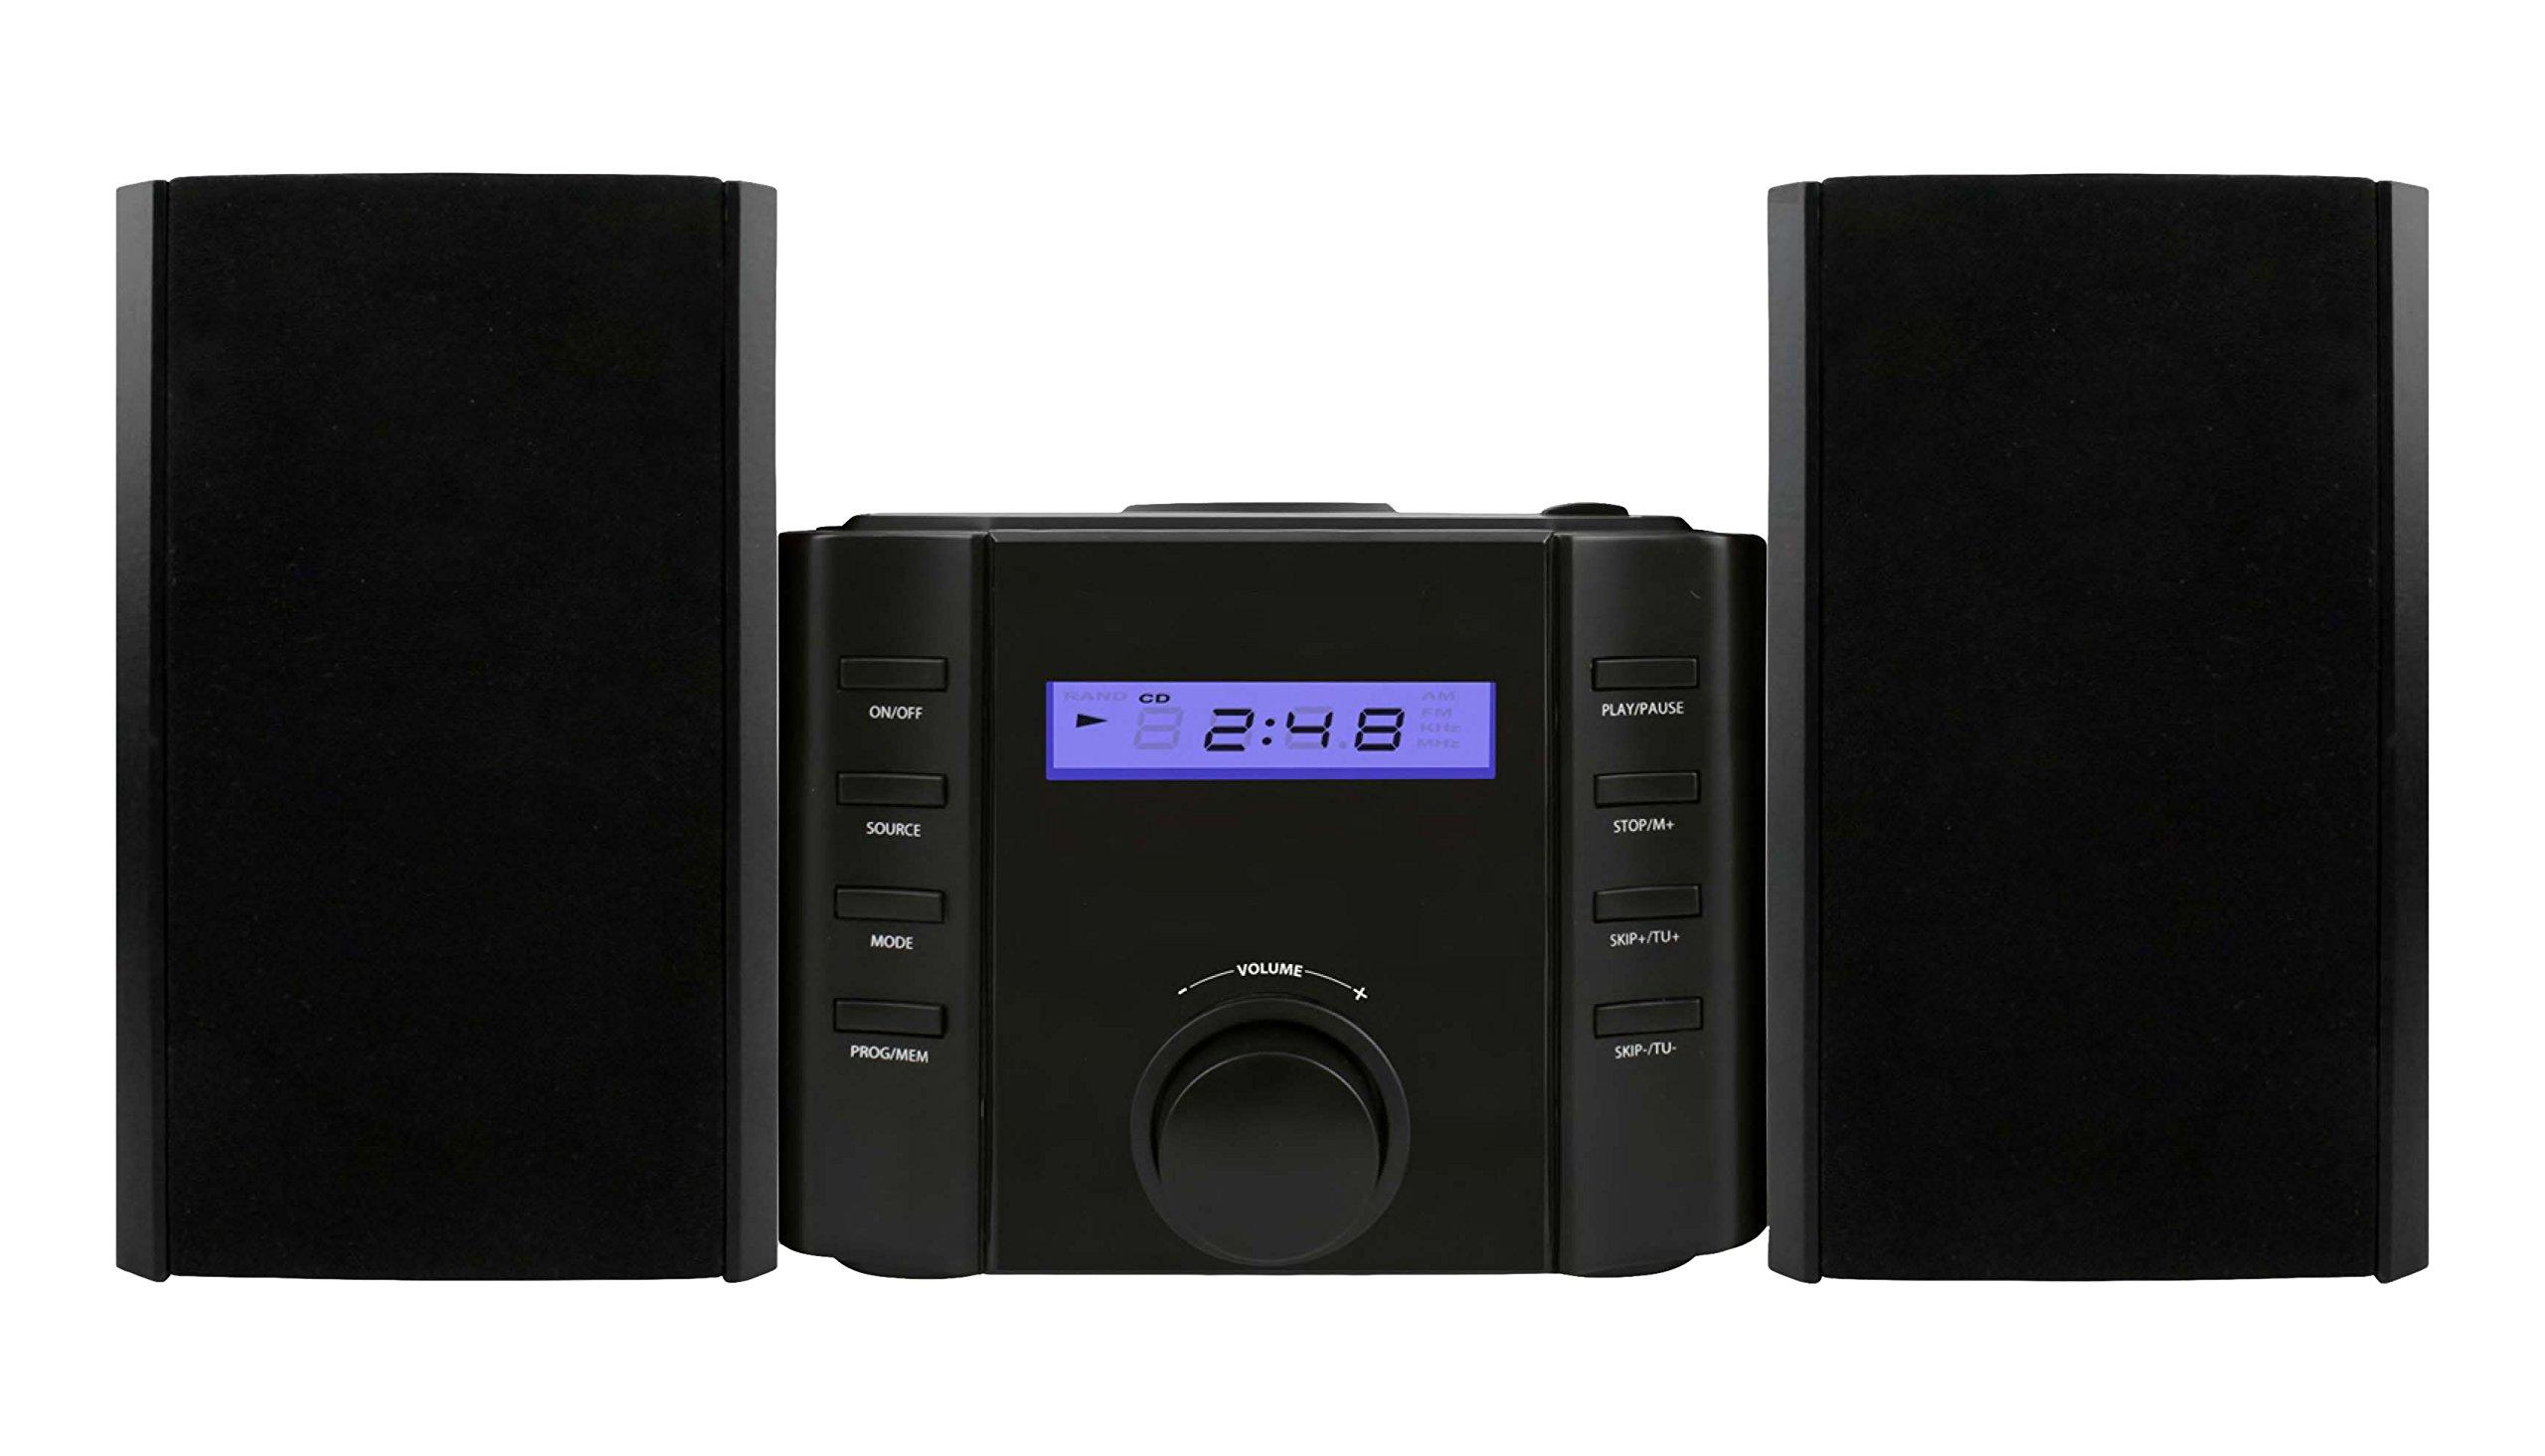 Sylvania SRCD804BT CD Microsystem with Radio and Bluetooth by SYLVANIA